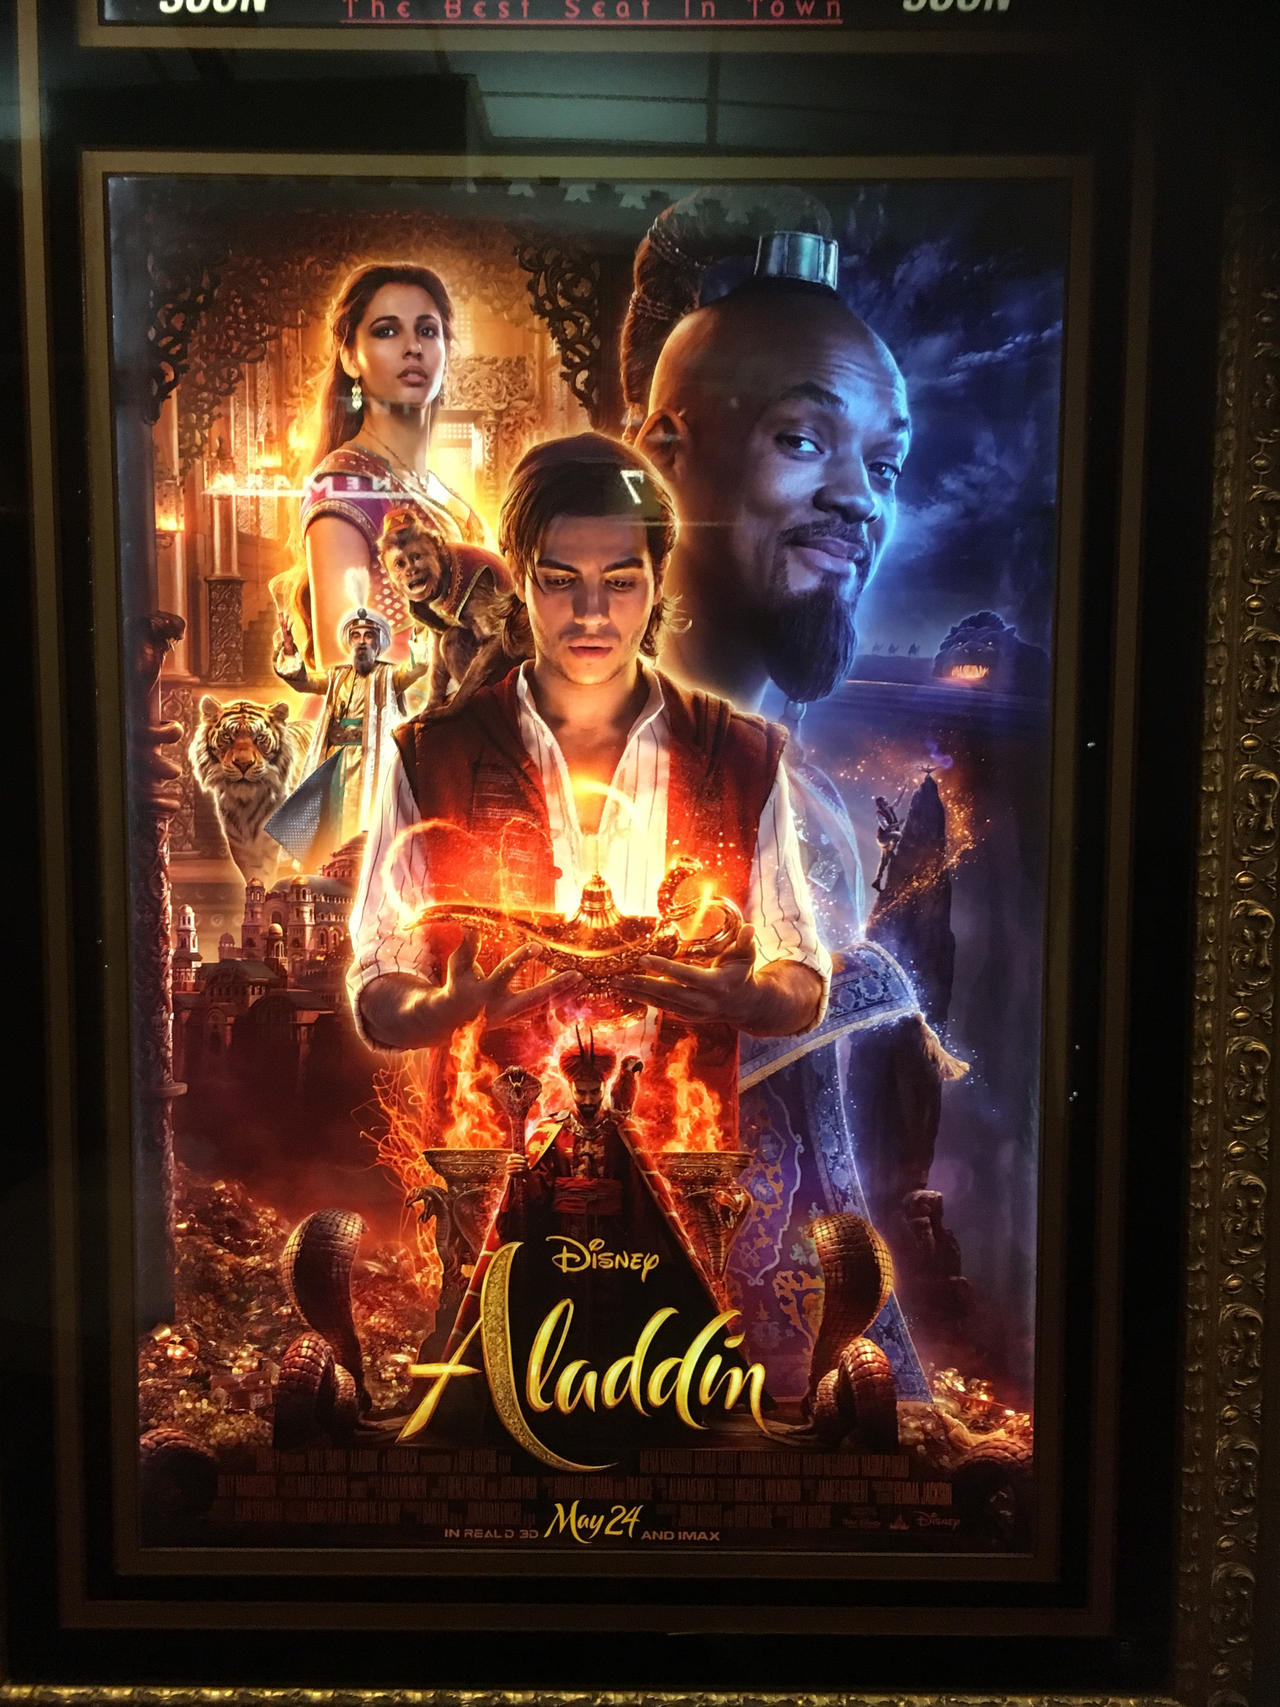 Aladdin 2019 poster by rdj1995 on deviantart - Aladdin 2019 poster ...